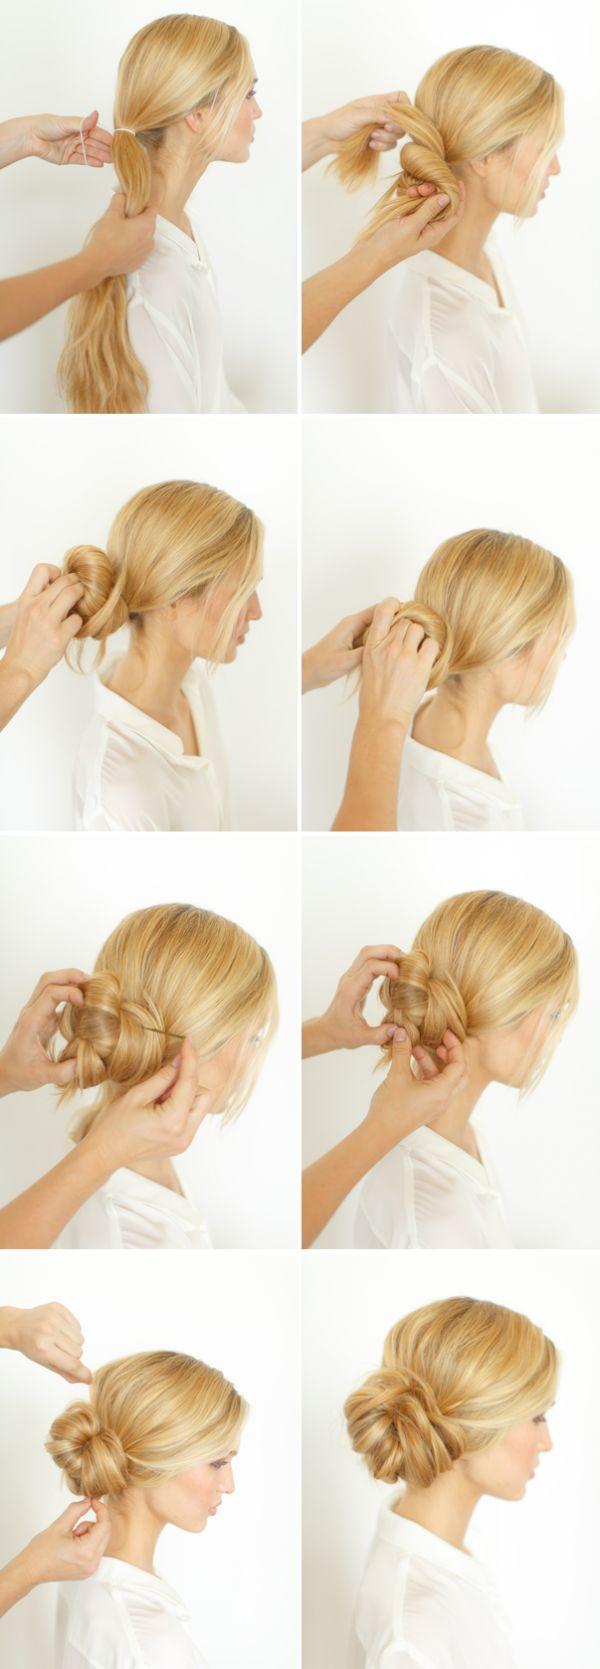 tutorial-peinado-boda-moc3b1o-bajo-despeinado-2.png (600×1669)